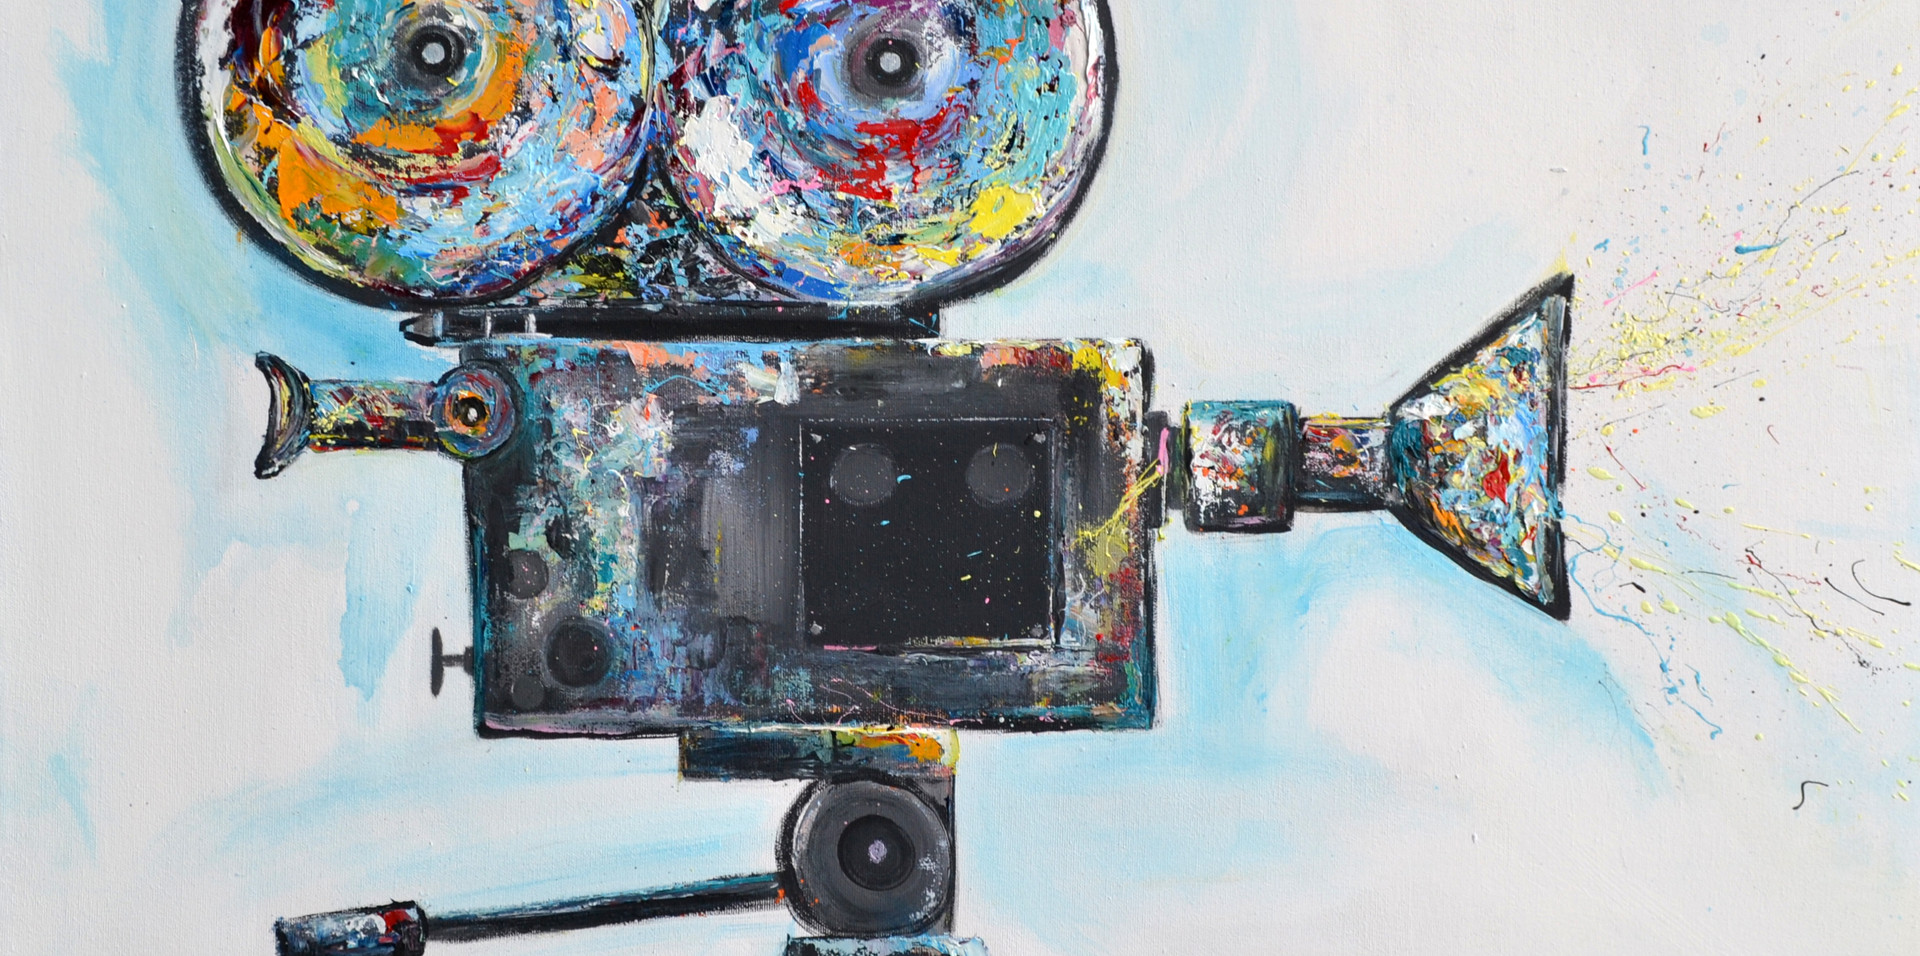 Film camera *SOLD*